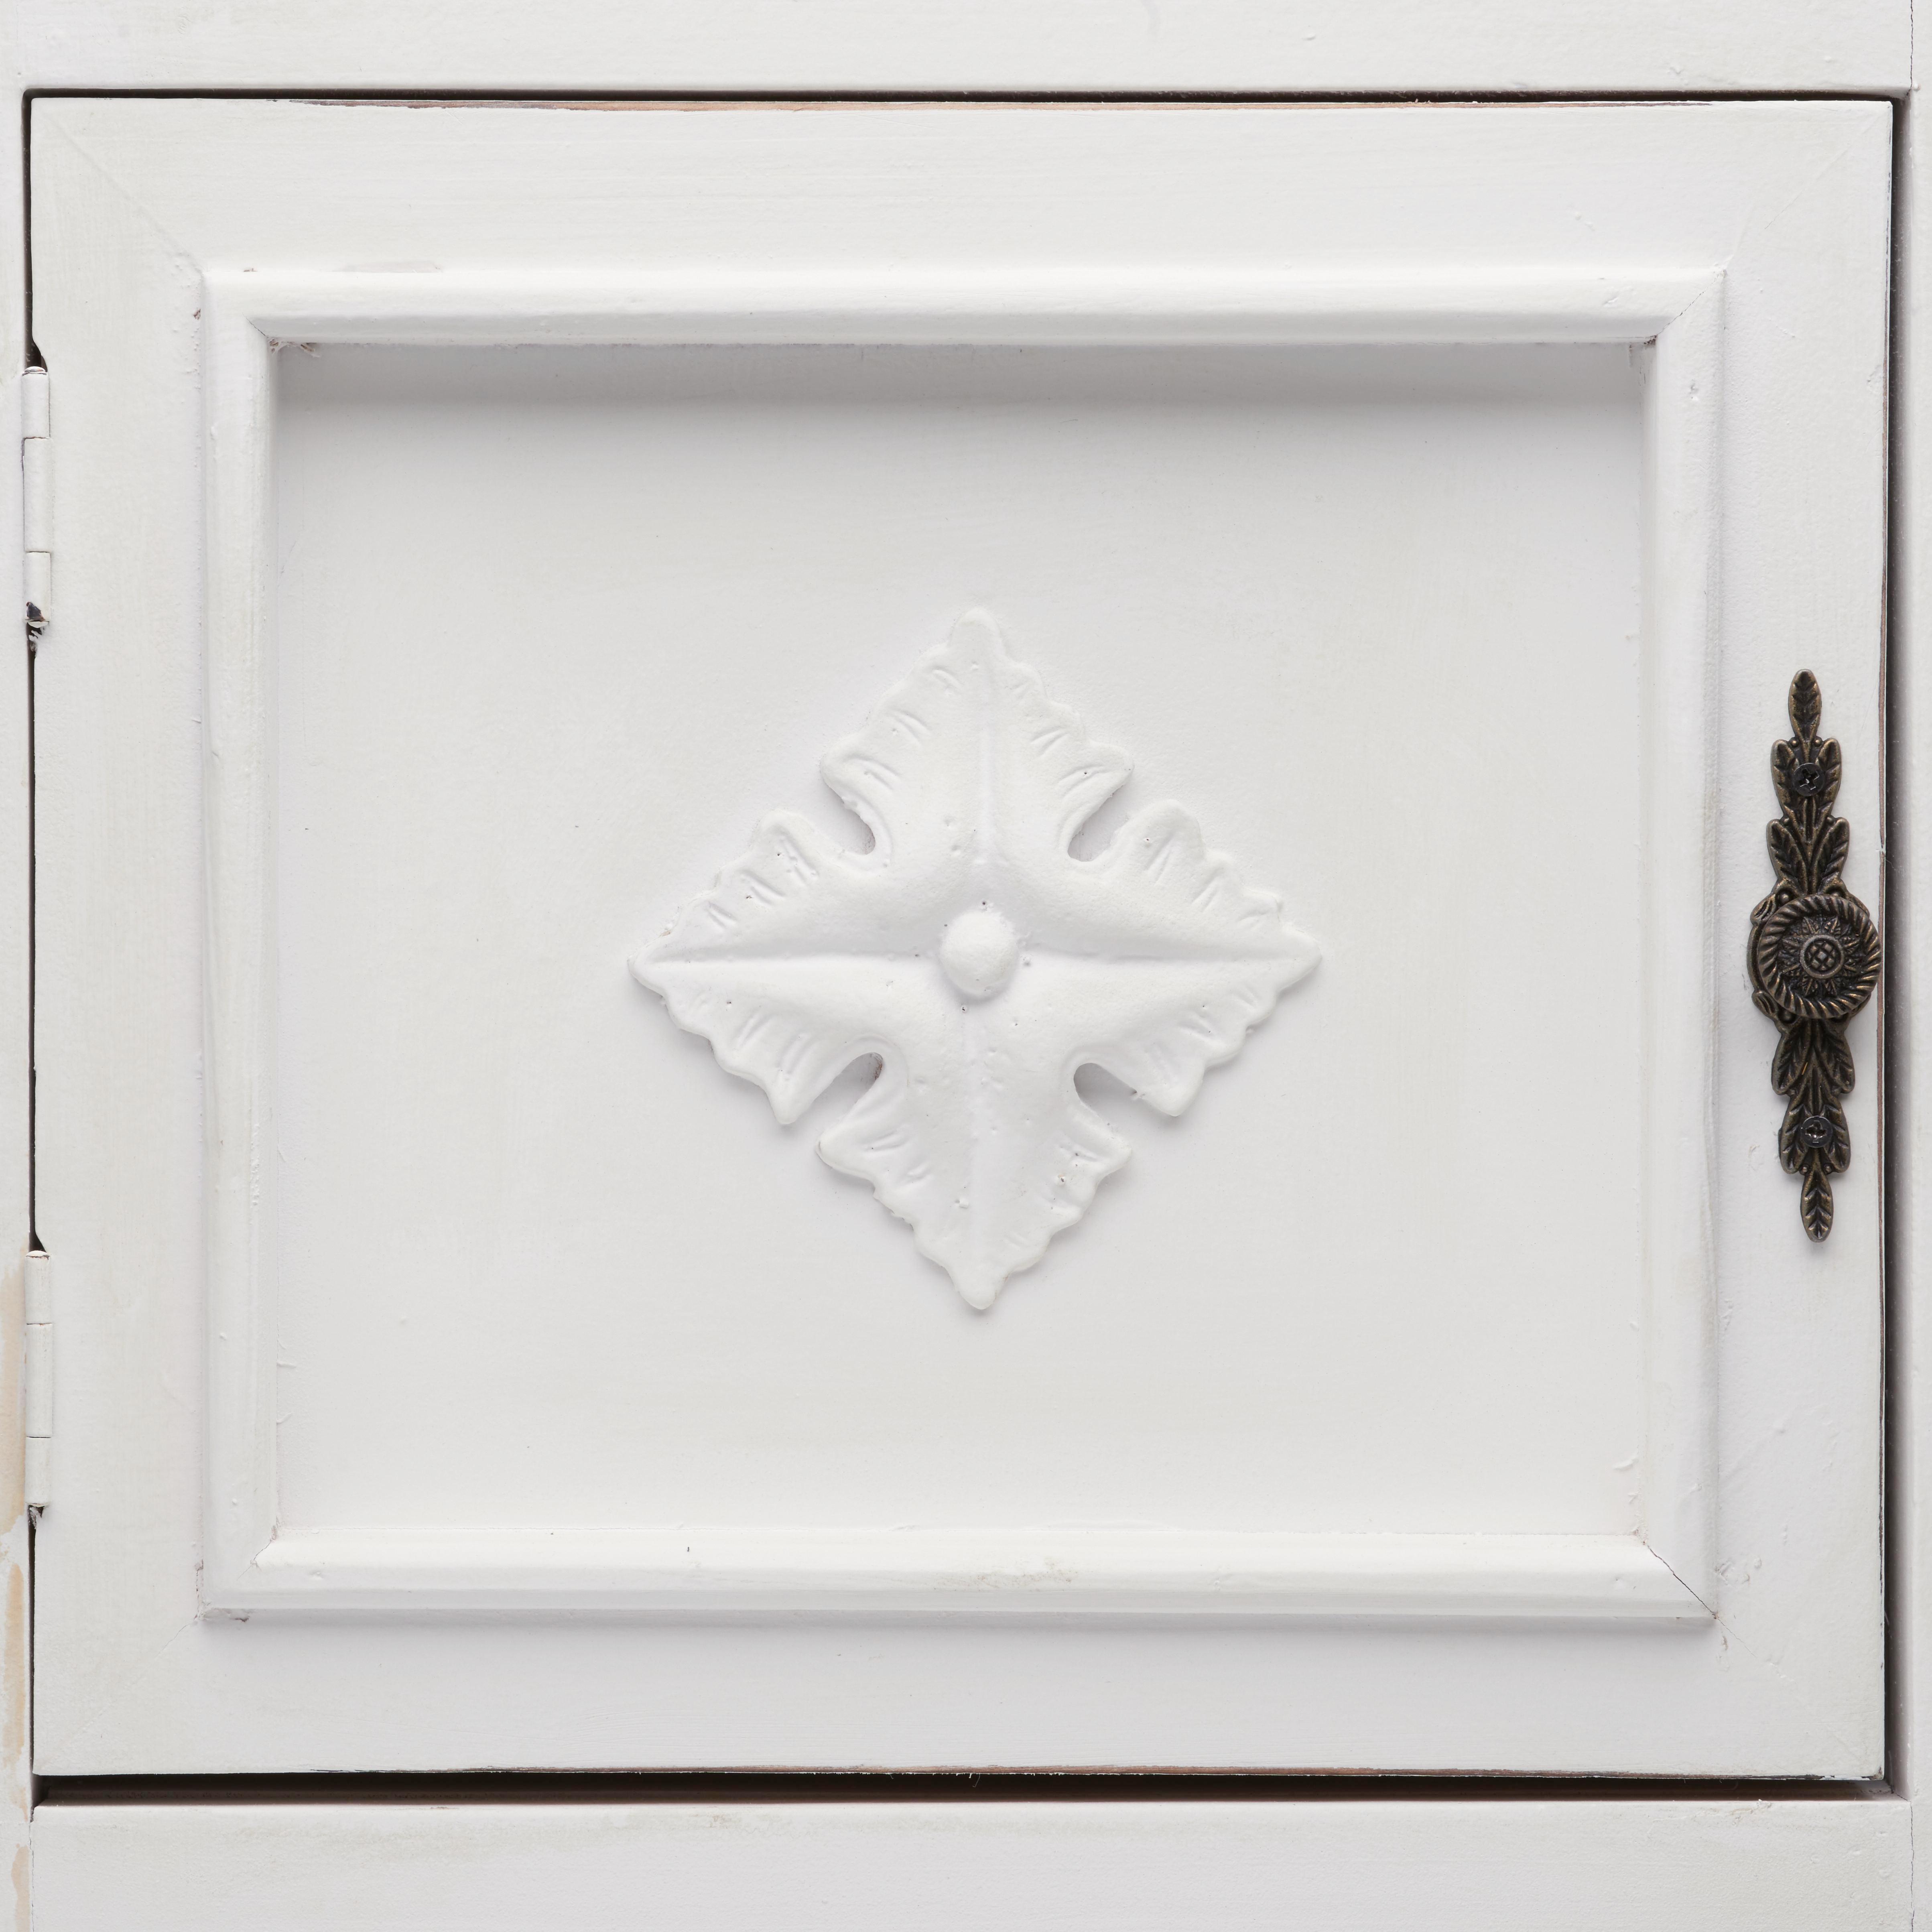 Vitrine Joelle - Weiß, ROMANTIK / LANDHAUS, Glas/Holz (71/138/35cm) - MÖMAX modern living